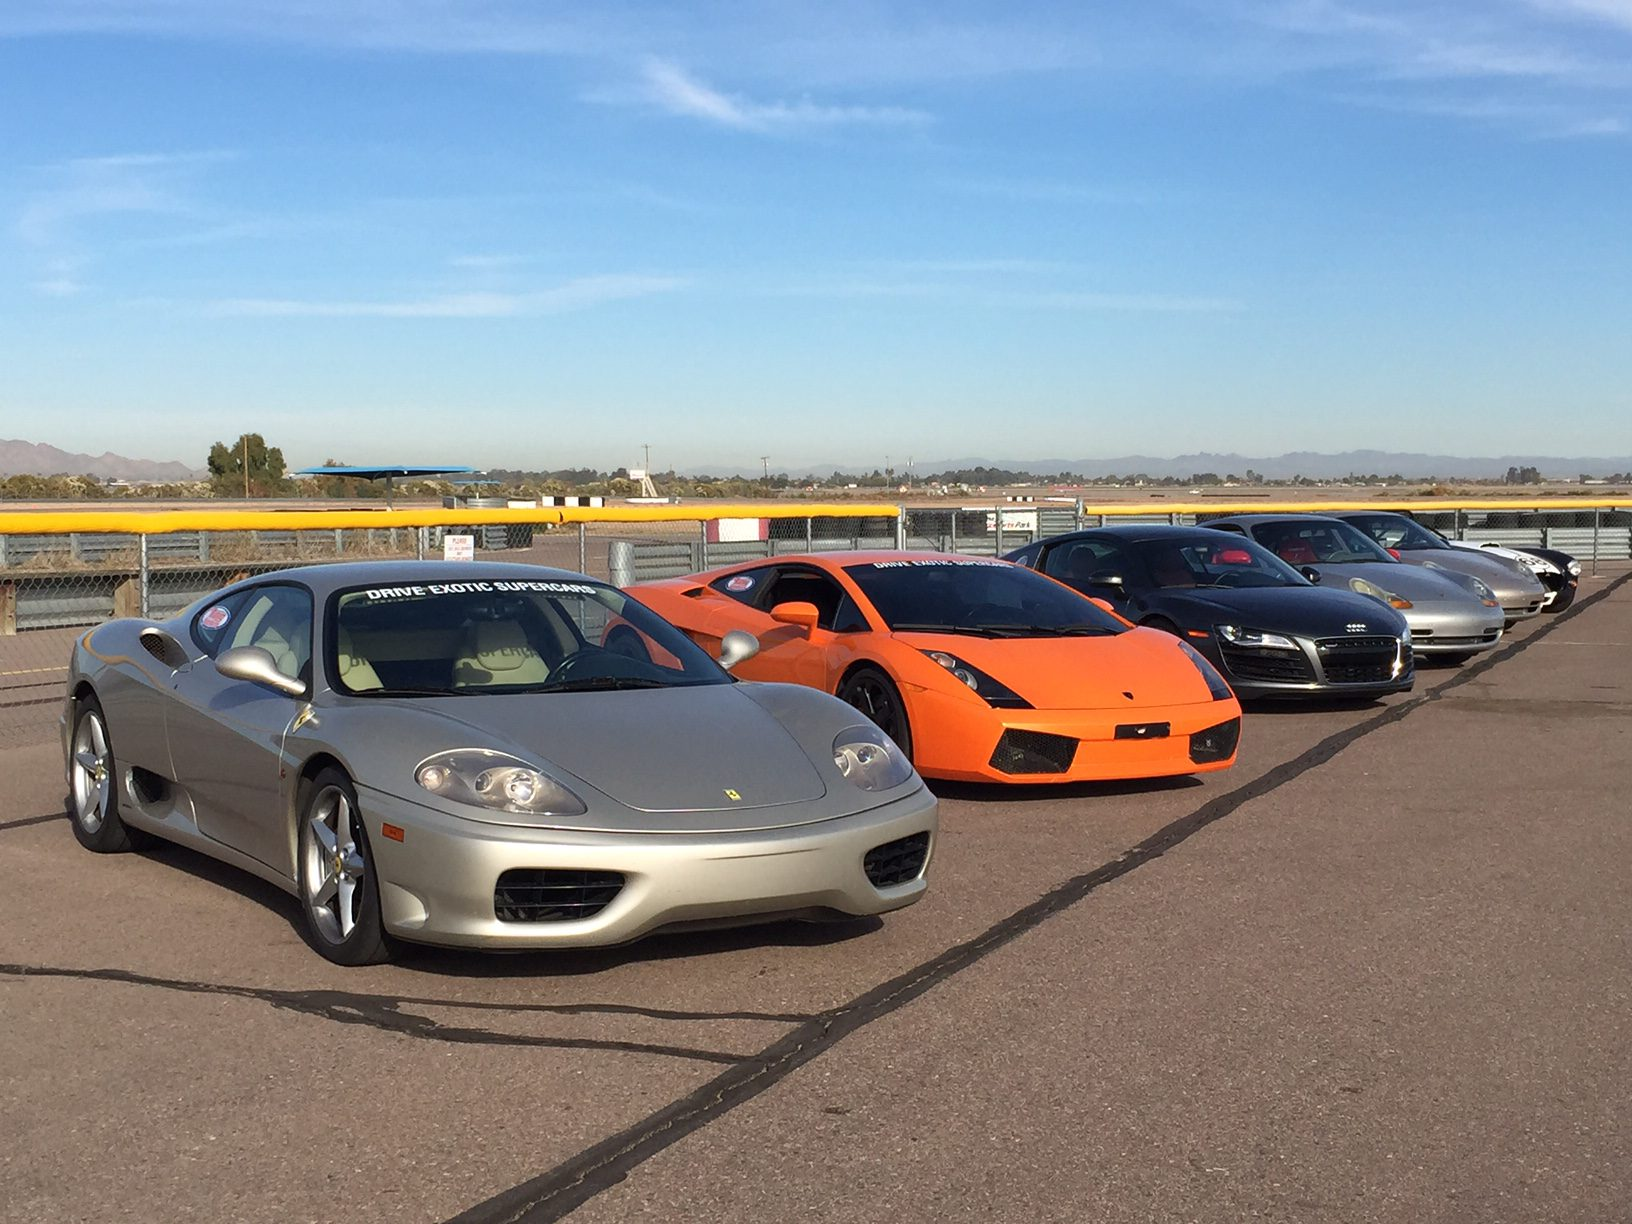 Exotic Supercar Experience Grandsport Motorsports Park